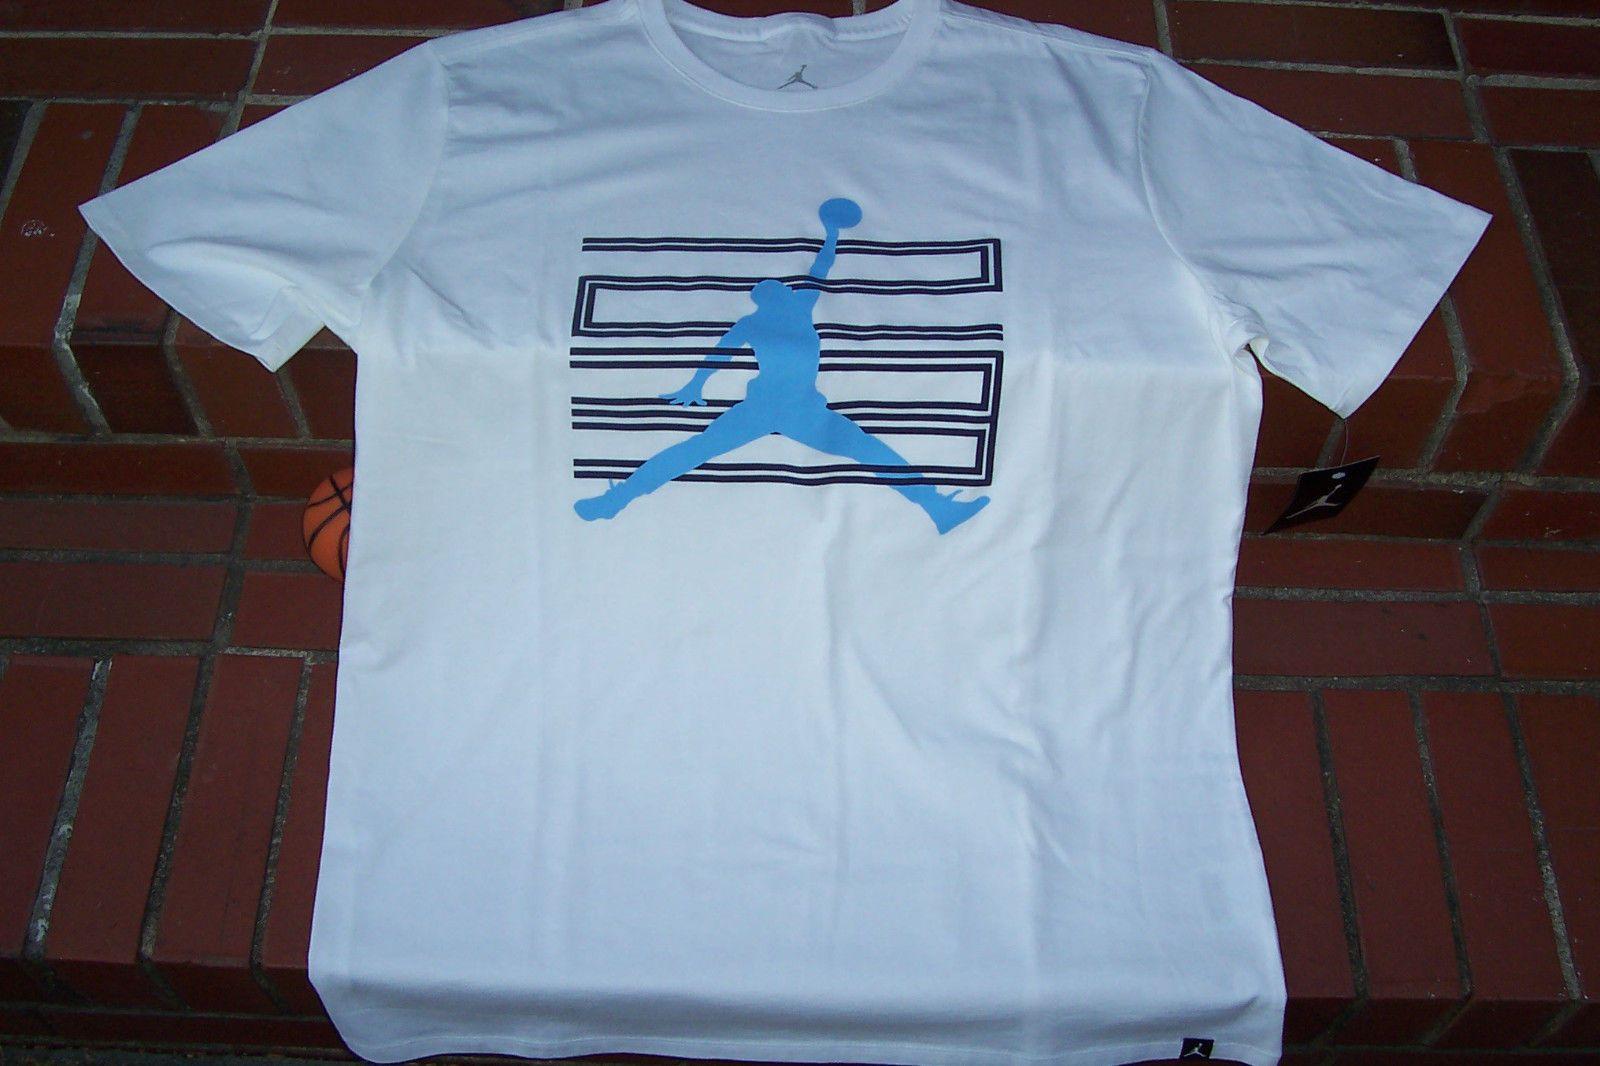 b619f40d2f68d5 BRAND-NEW Nike Air Jordan Retro 11 JUMPMAN 23 White Blue Men s T-Shirt  XL XLarge